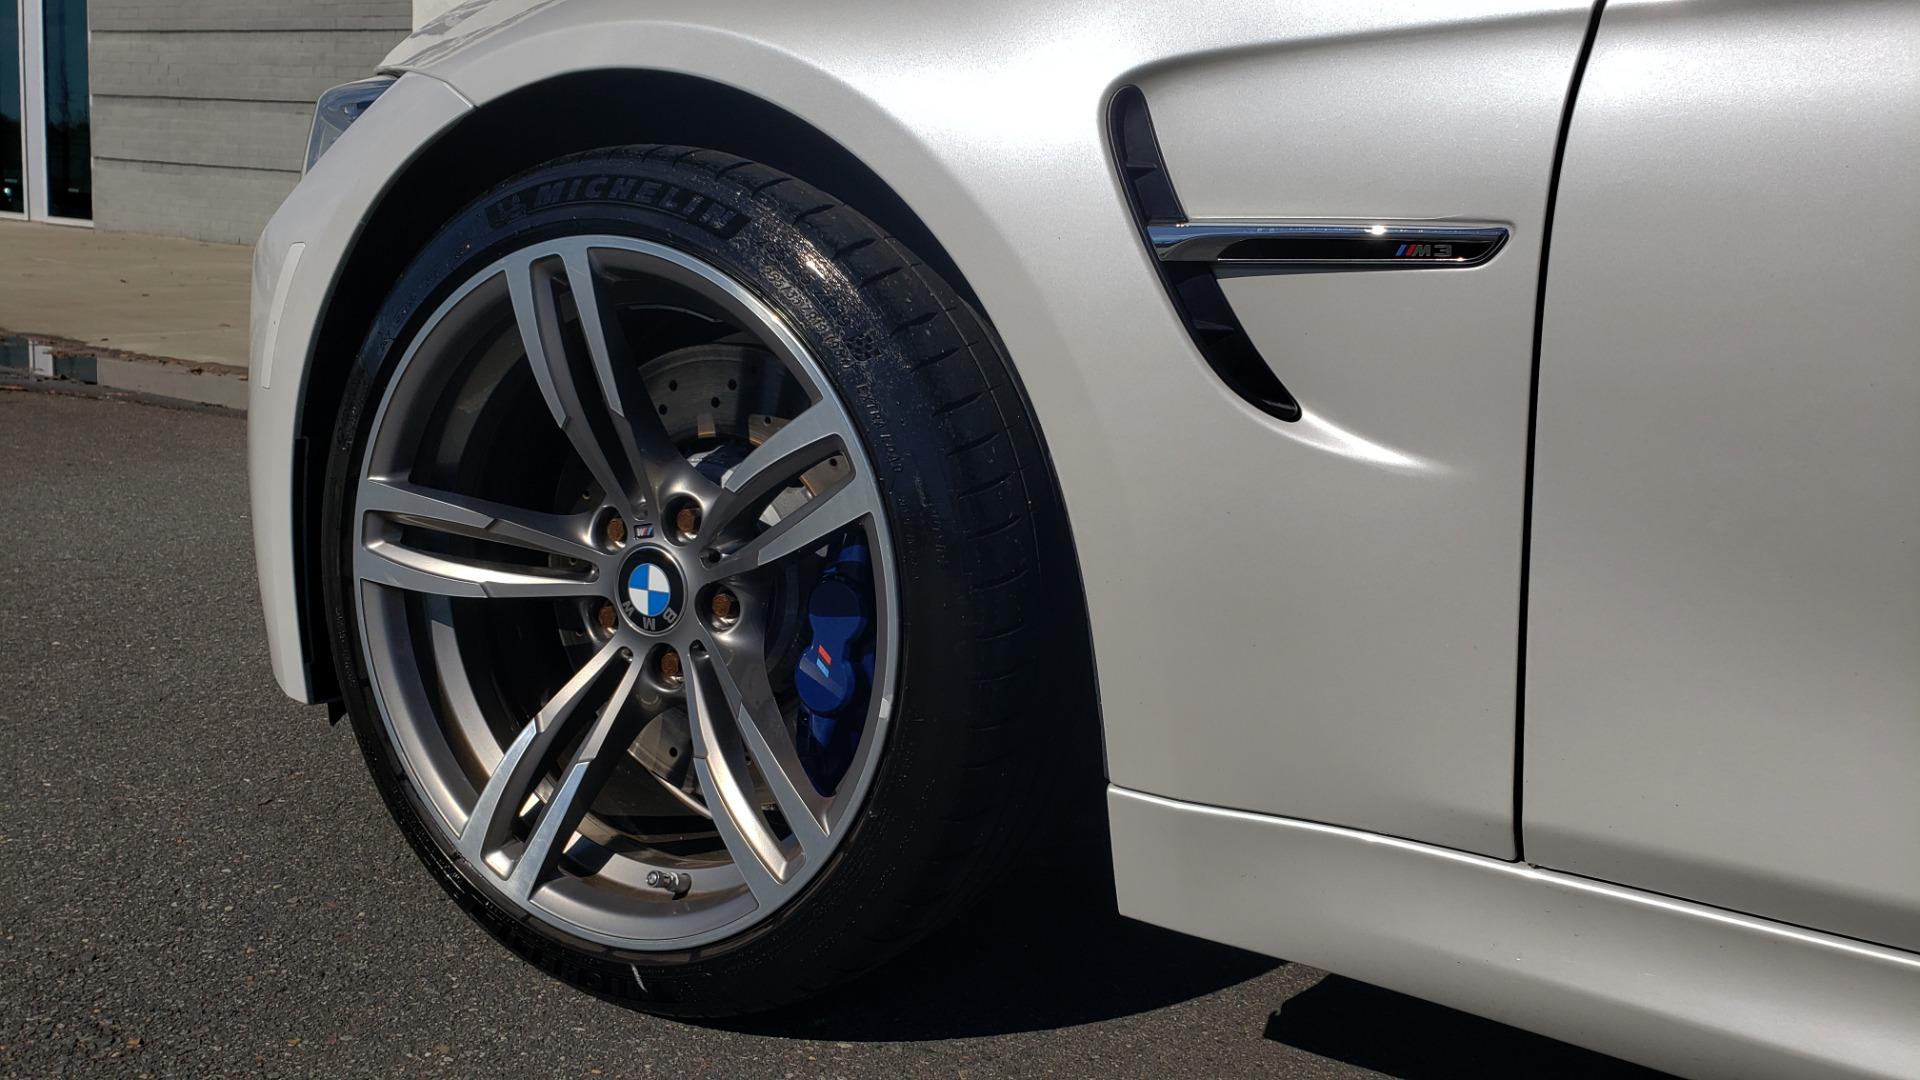 Used 2016 BMW M3 SEDAN / EXECUTIVE PKG / M-SUSPENSION / HARMAN/KARDON SOUND for sale Sold at Formula Imports in Charlotte NC 28227 10